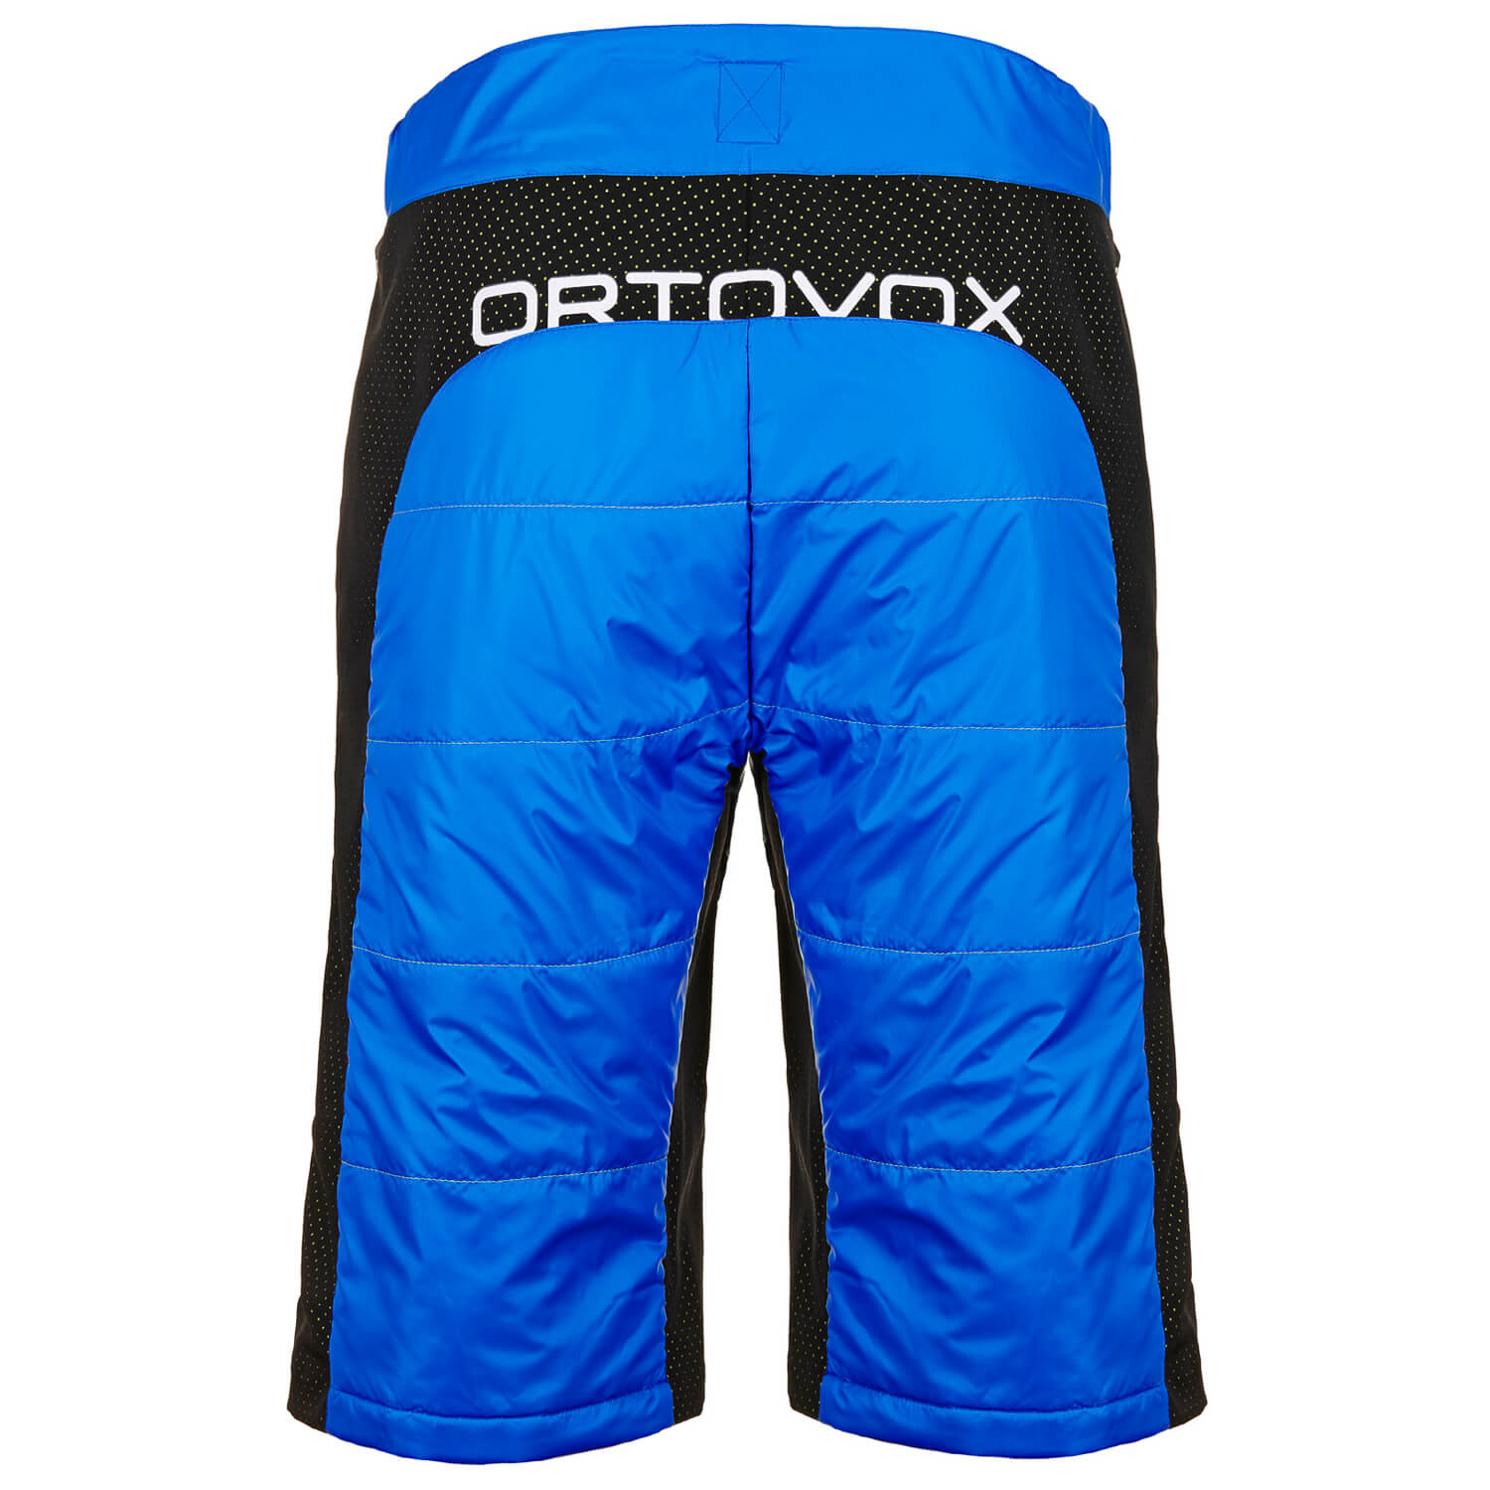 ortovox light tec shorts piz boe skitourenshorts online. Black Bedroom Furniture Sets. Home Design Ideas